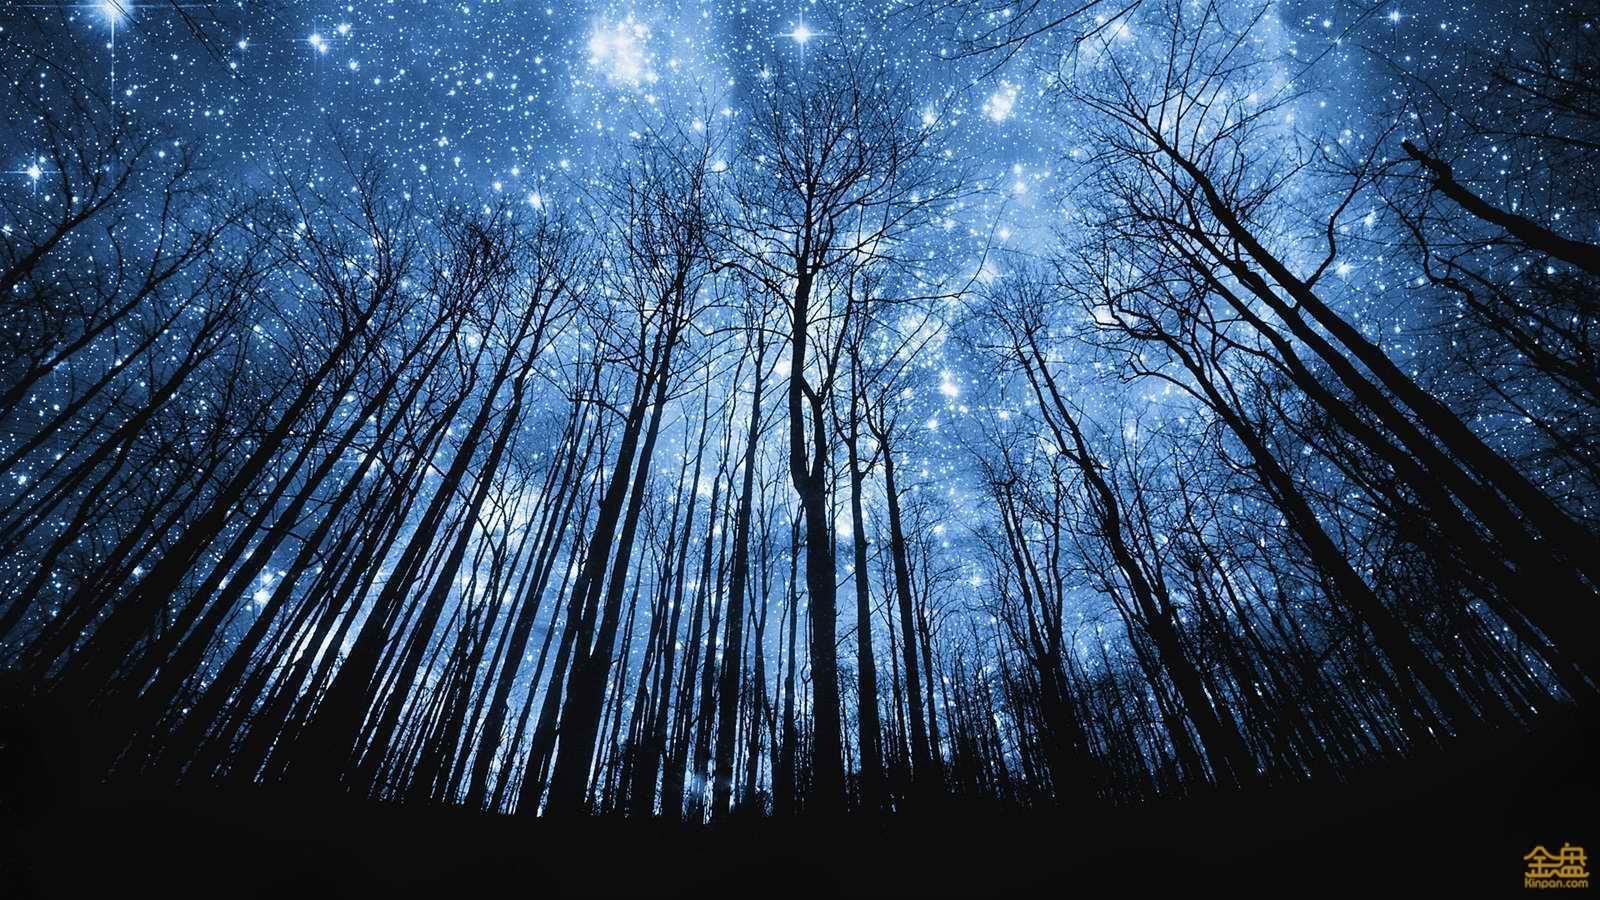 Forest-beautiful-blue-starry-night_1600x900 (1).jpg